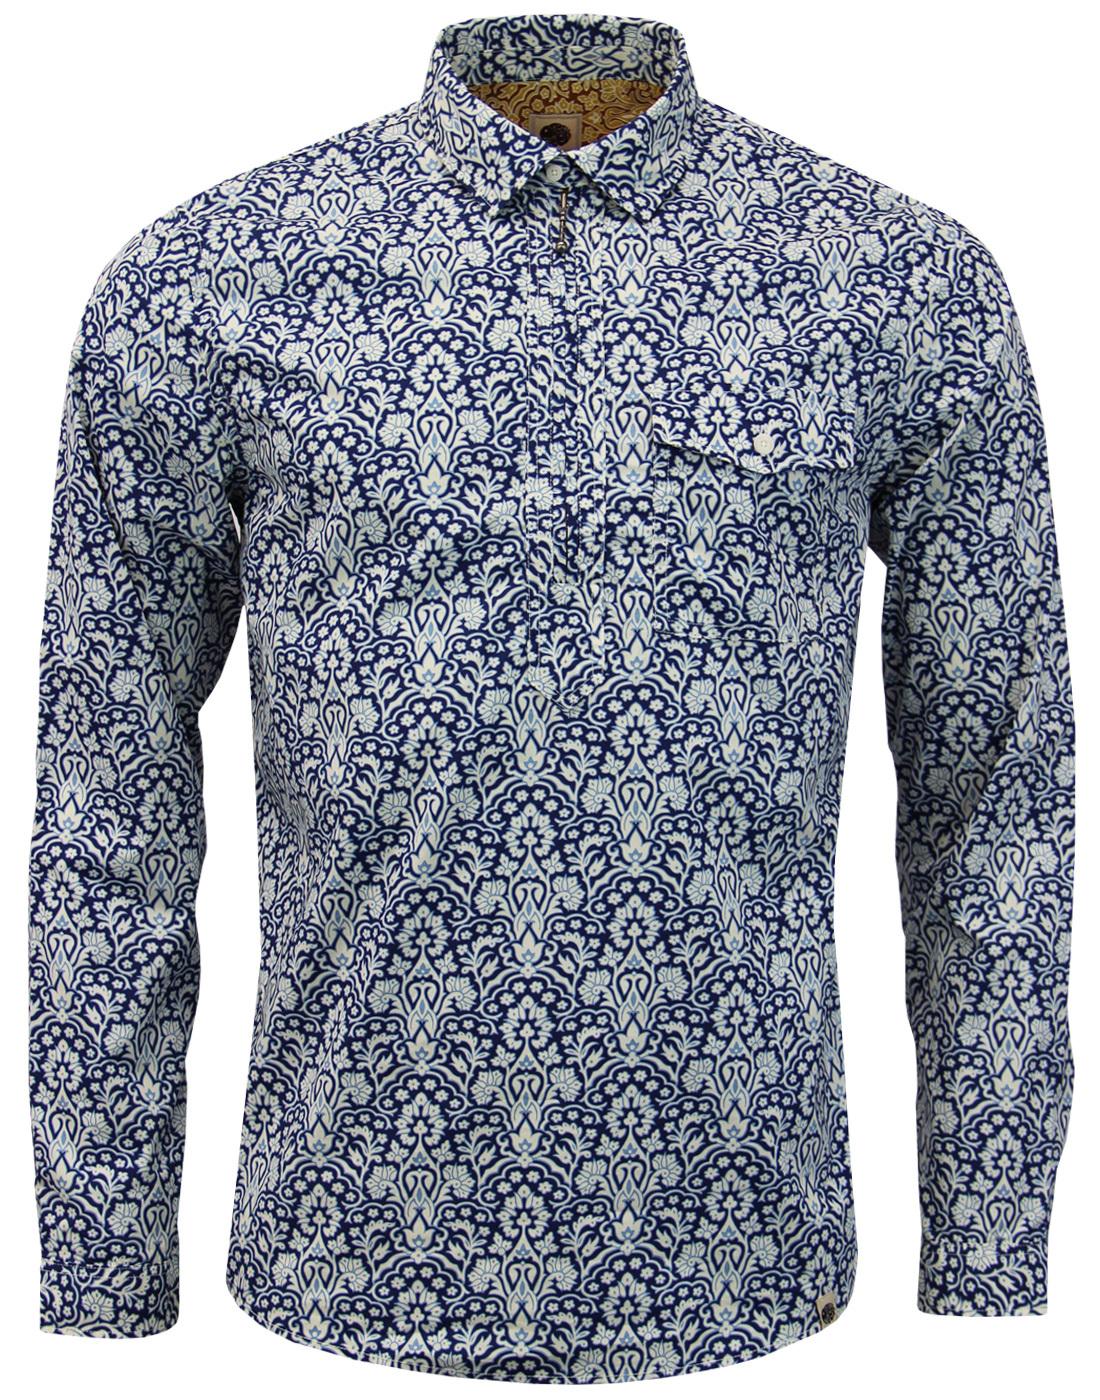 Sundew PRETTY GREEN 60s Zip Up Floral Shirt NAVY